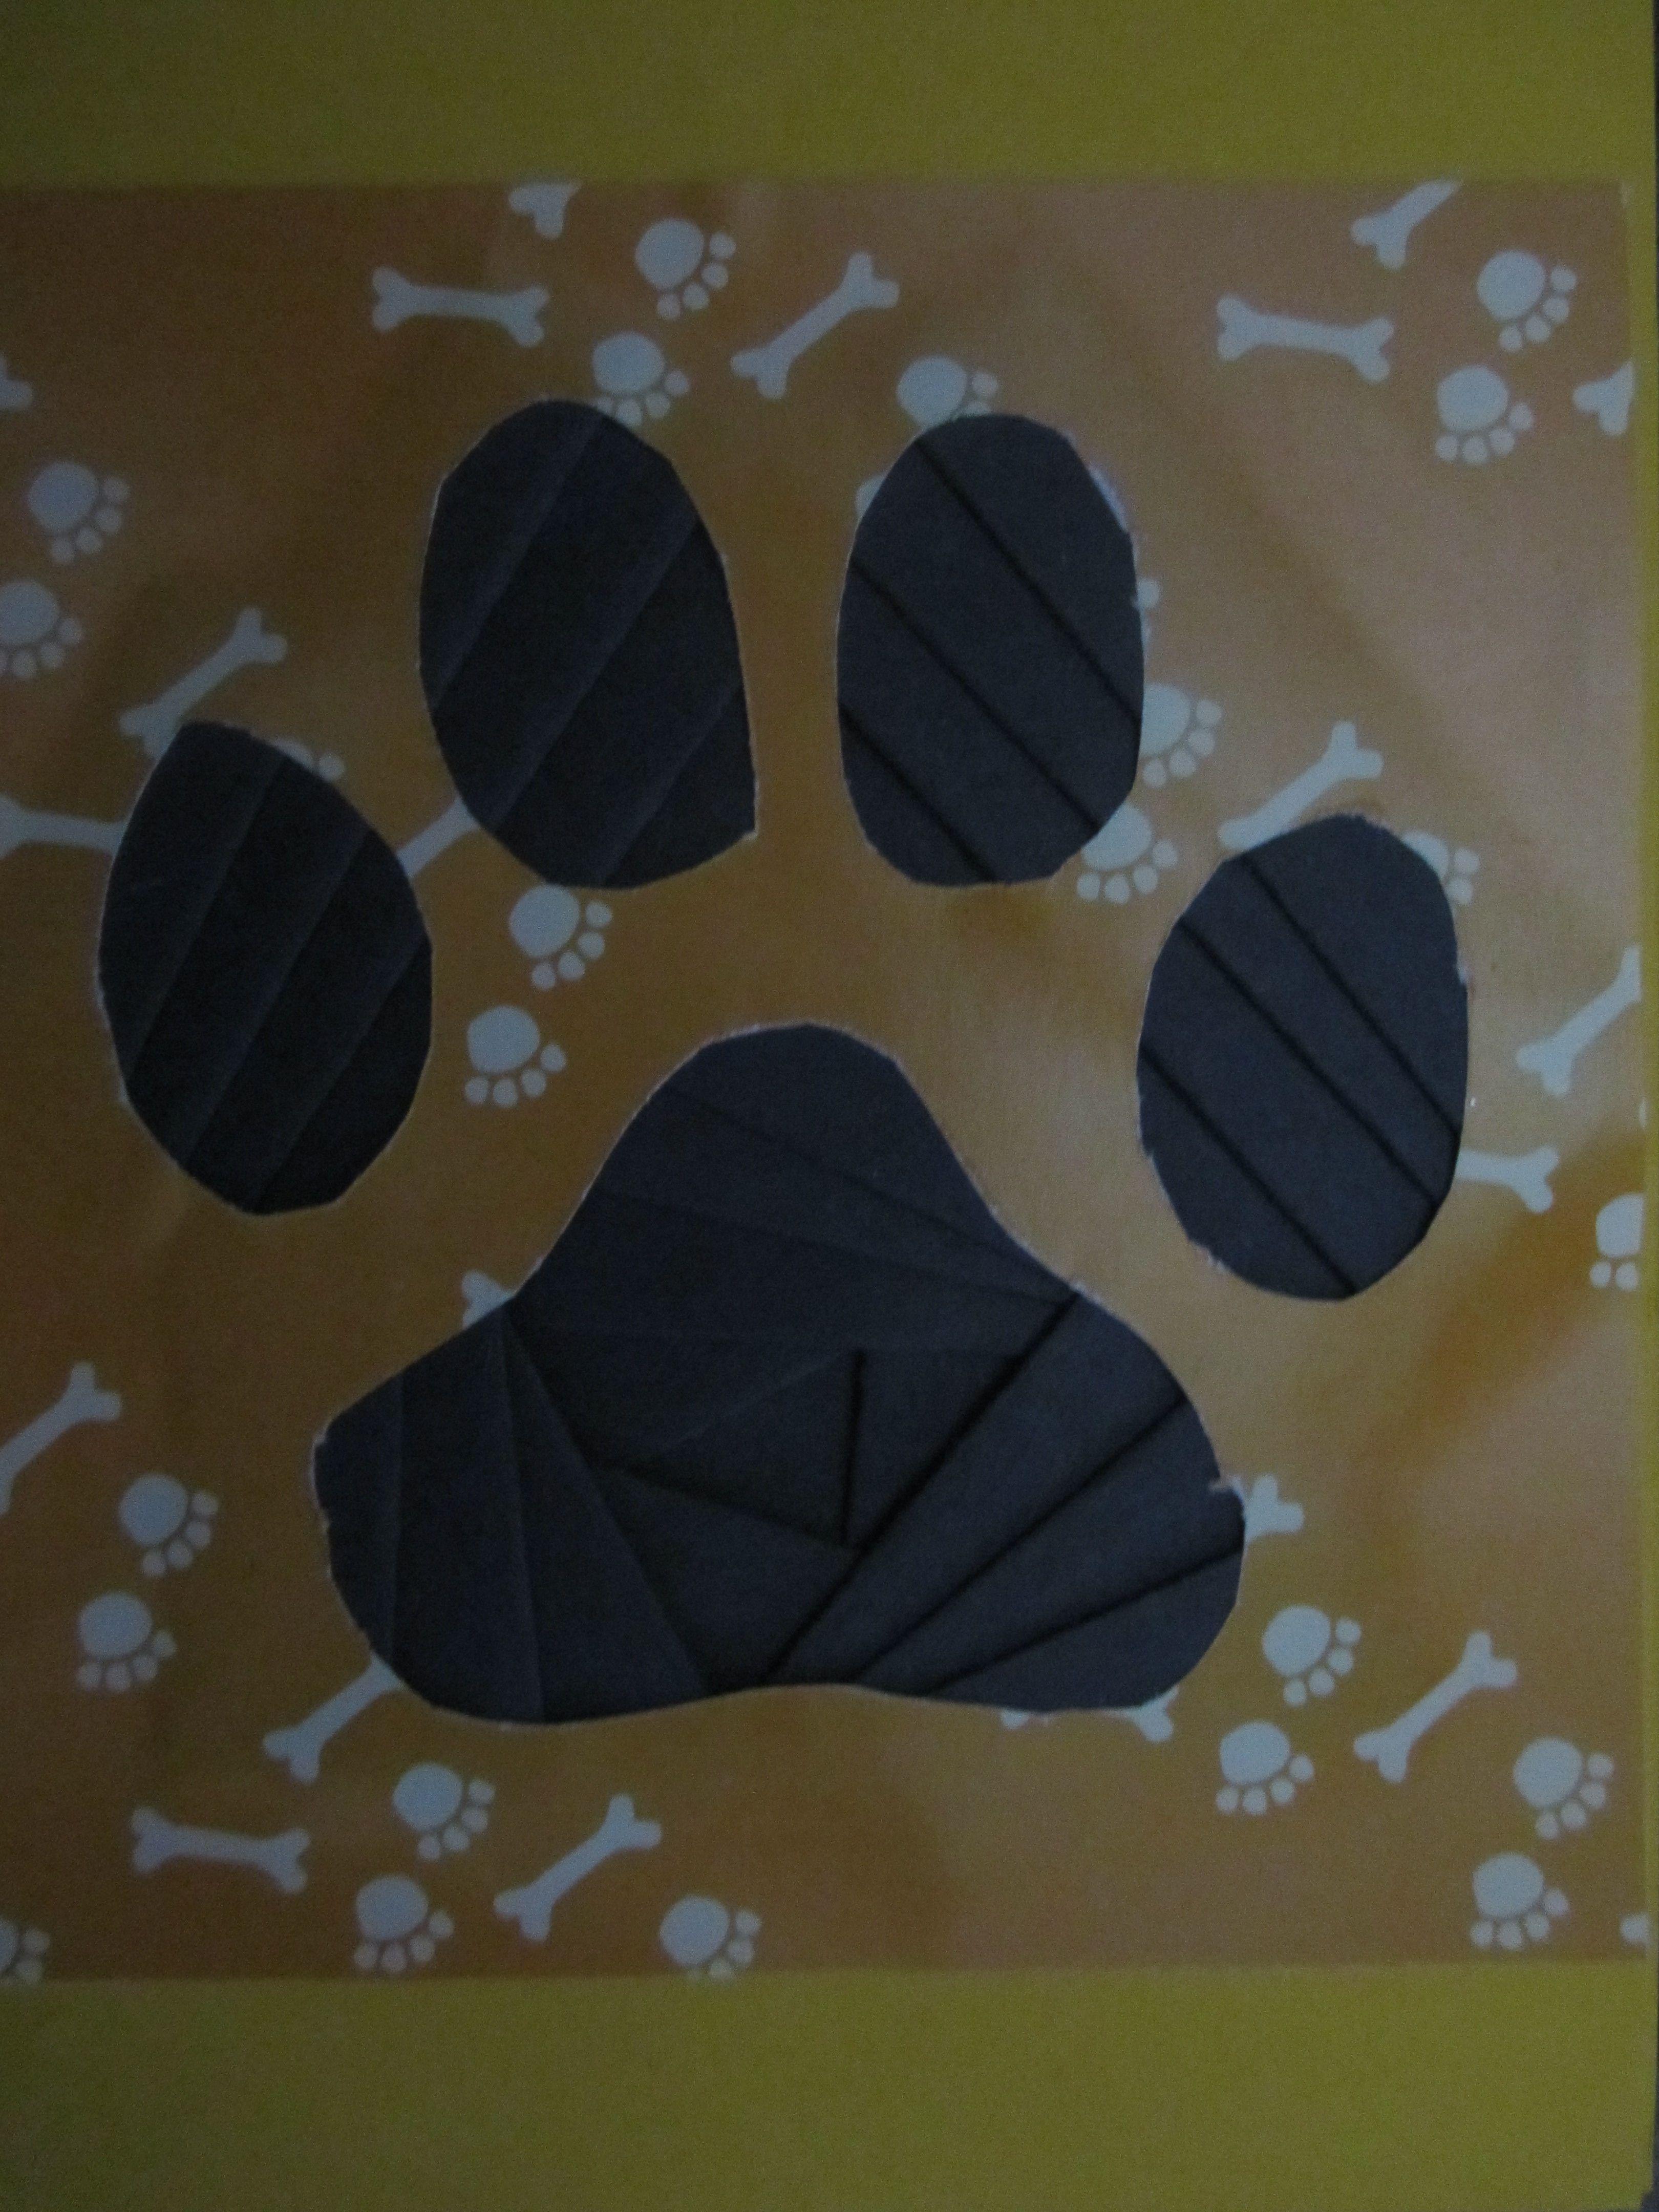 Iris paper folding paw print card wwwcaguimbalcreations